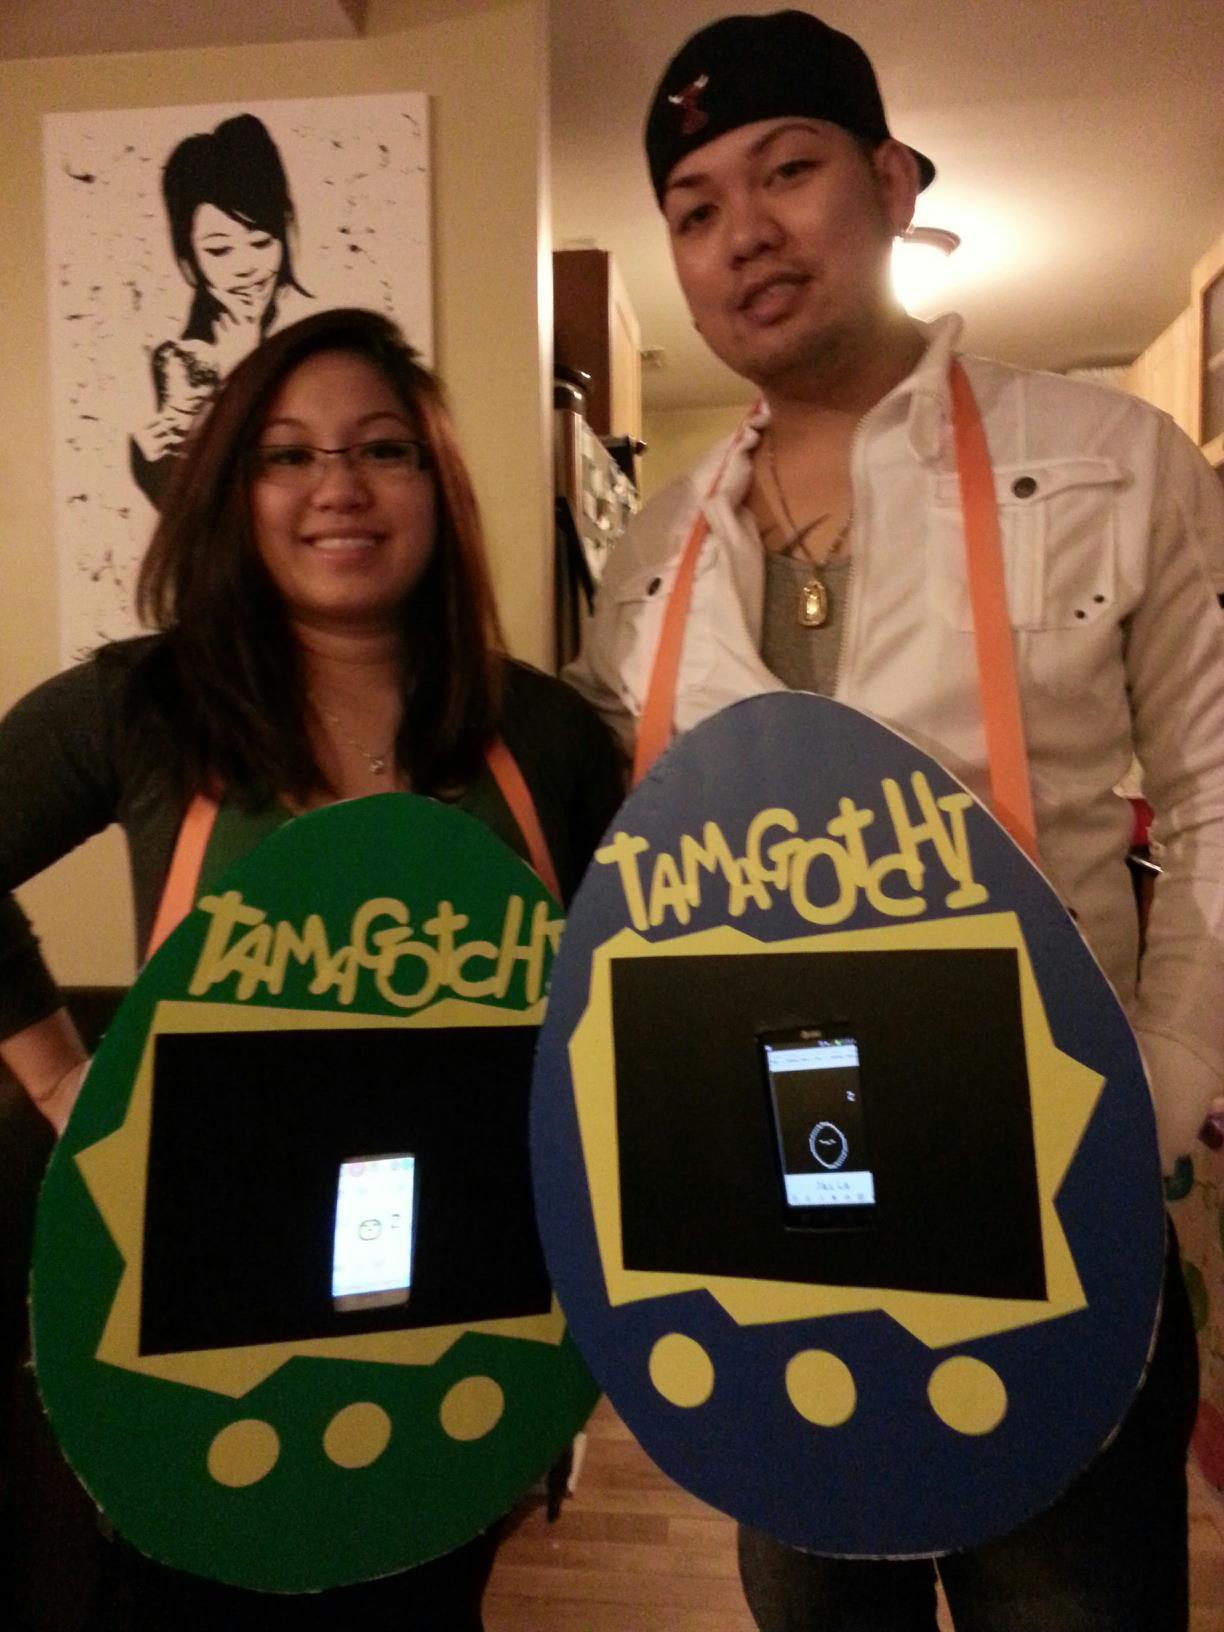 Easy Technology Halloween Costume Ideas - Digital Doc